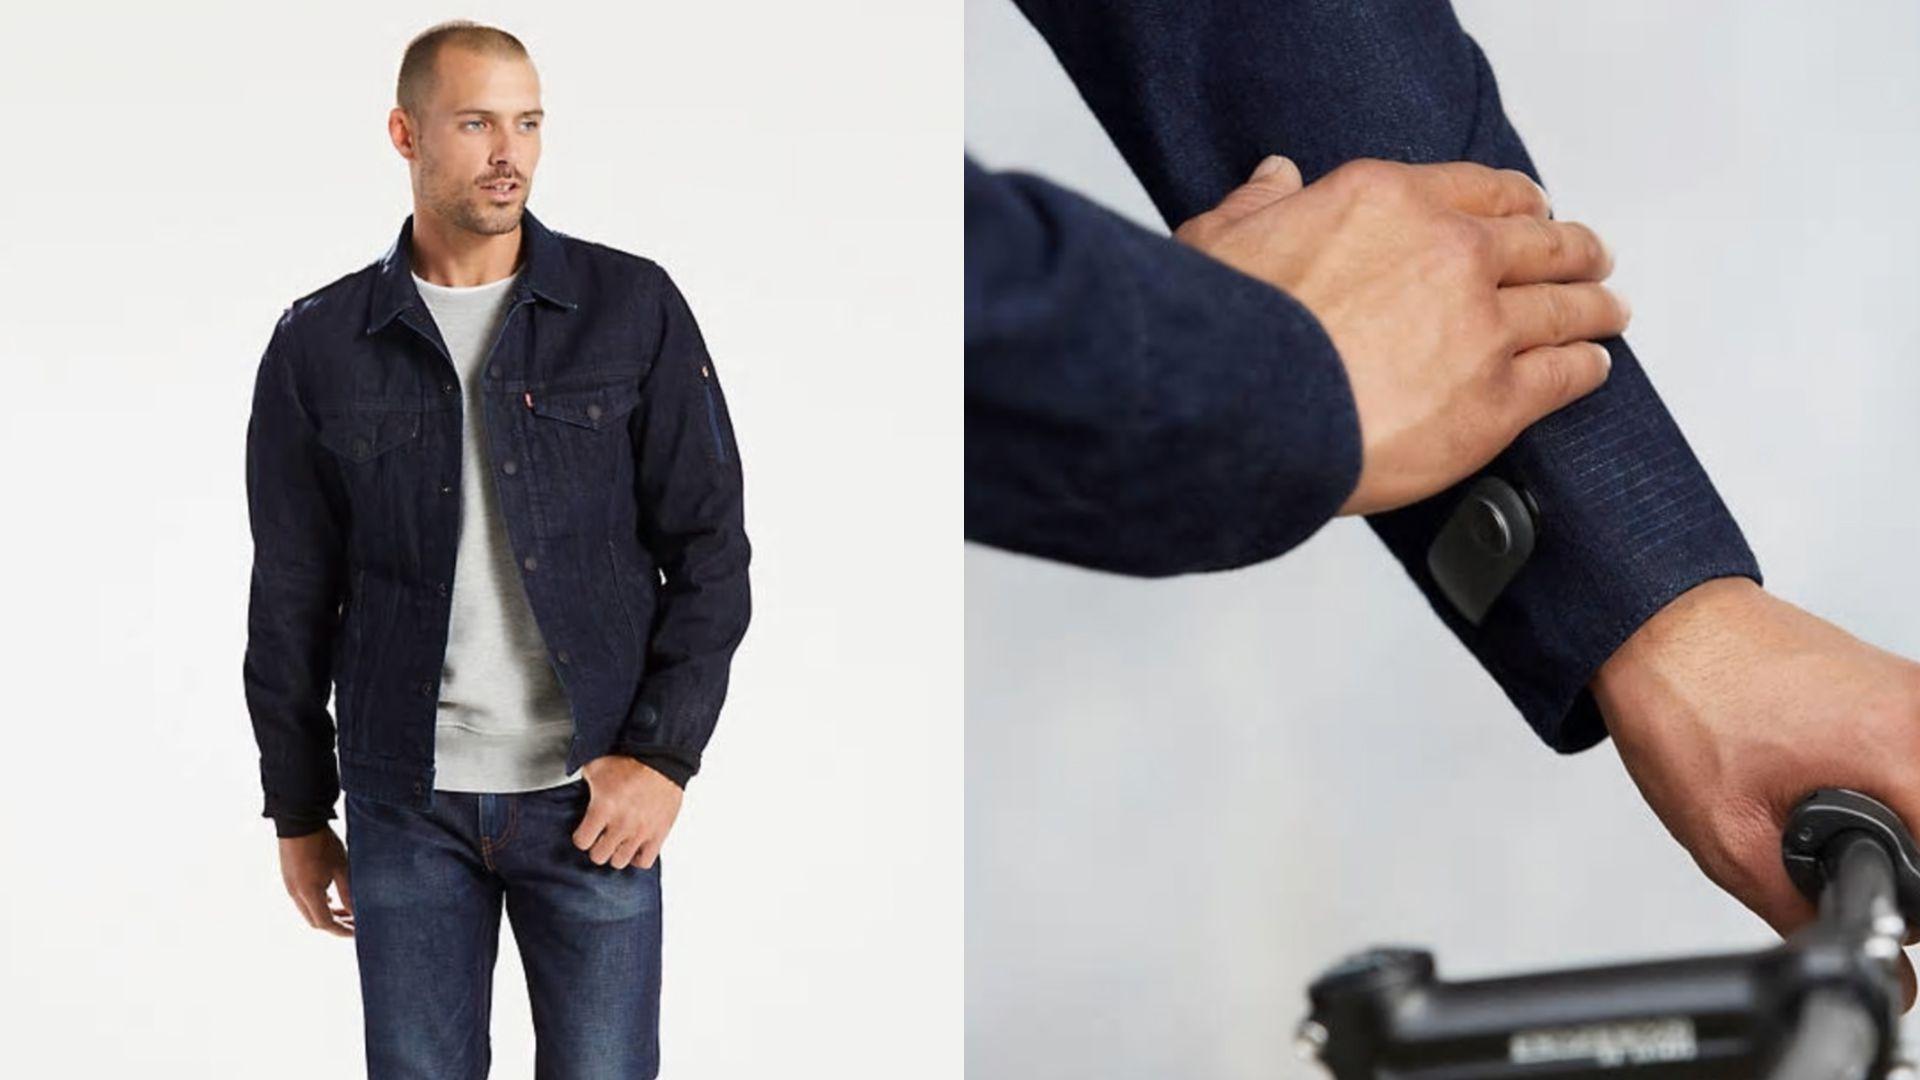 Levi's Commuter x Jacquard by Google smart clothing